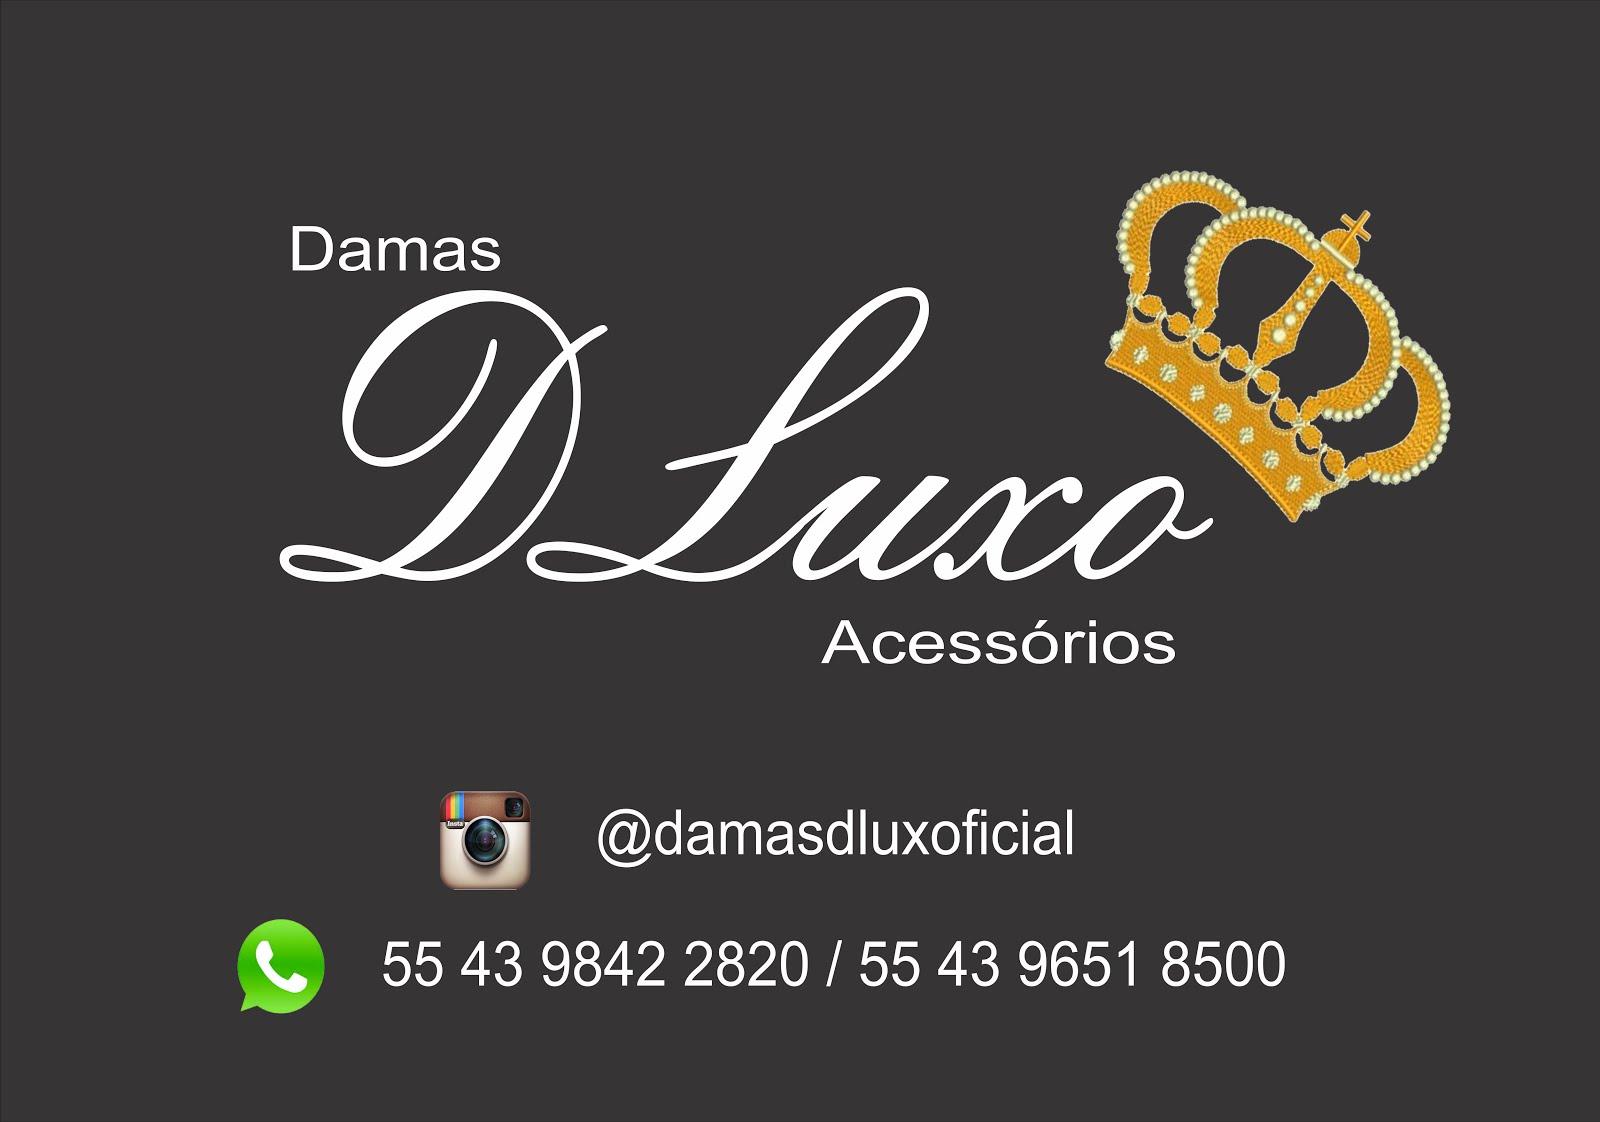 DamasdLuxo